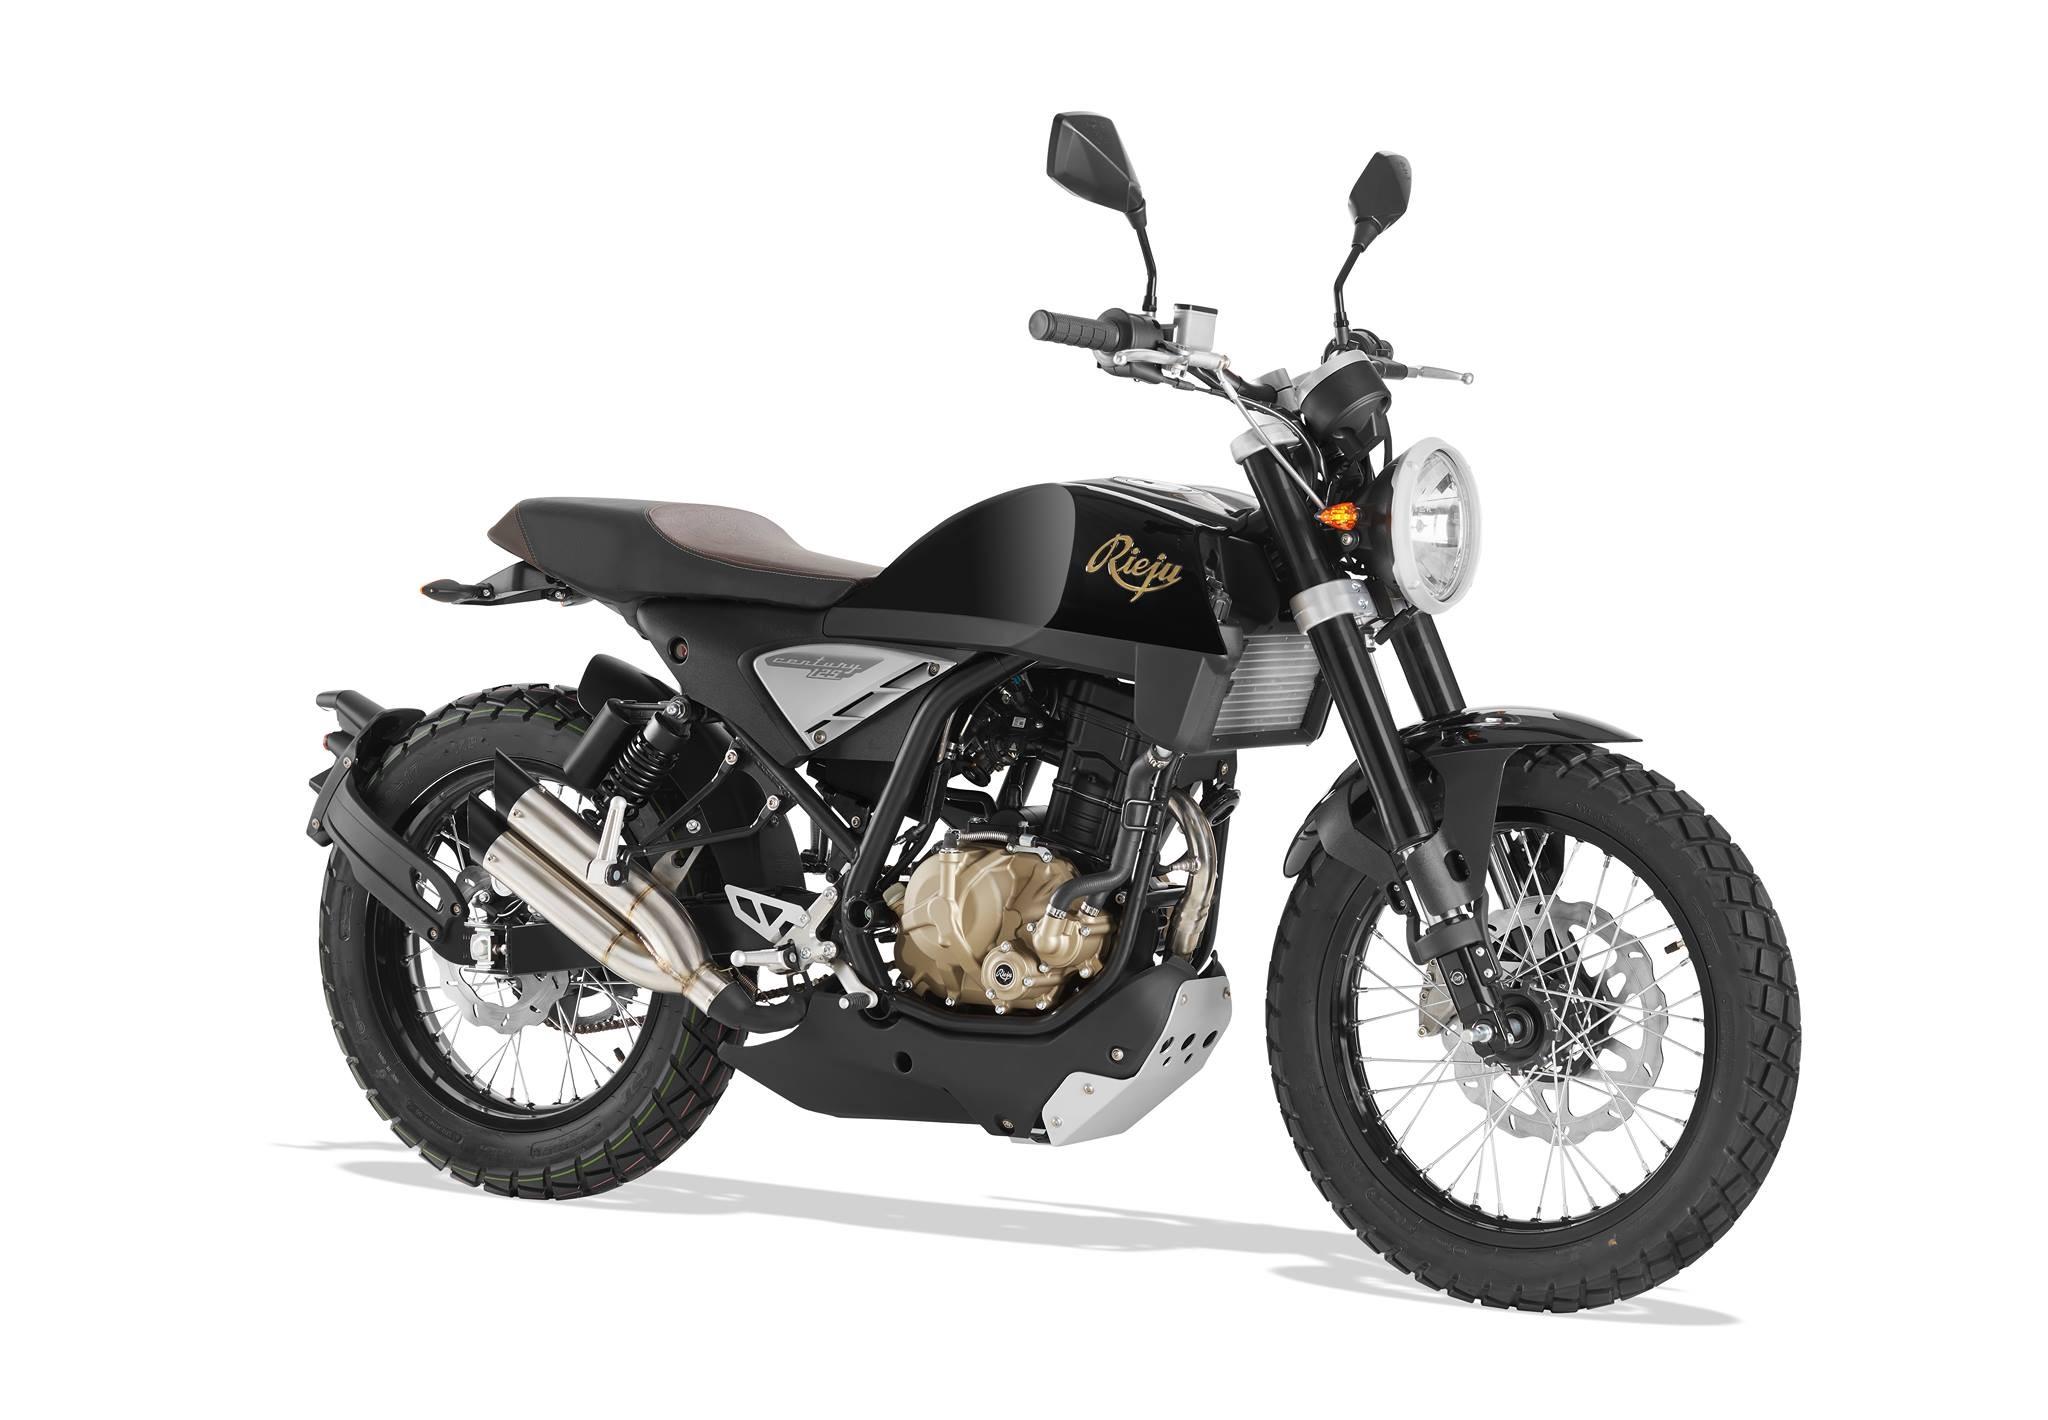 Moto, Rieju, Century 125 Euro 5, 4349€